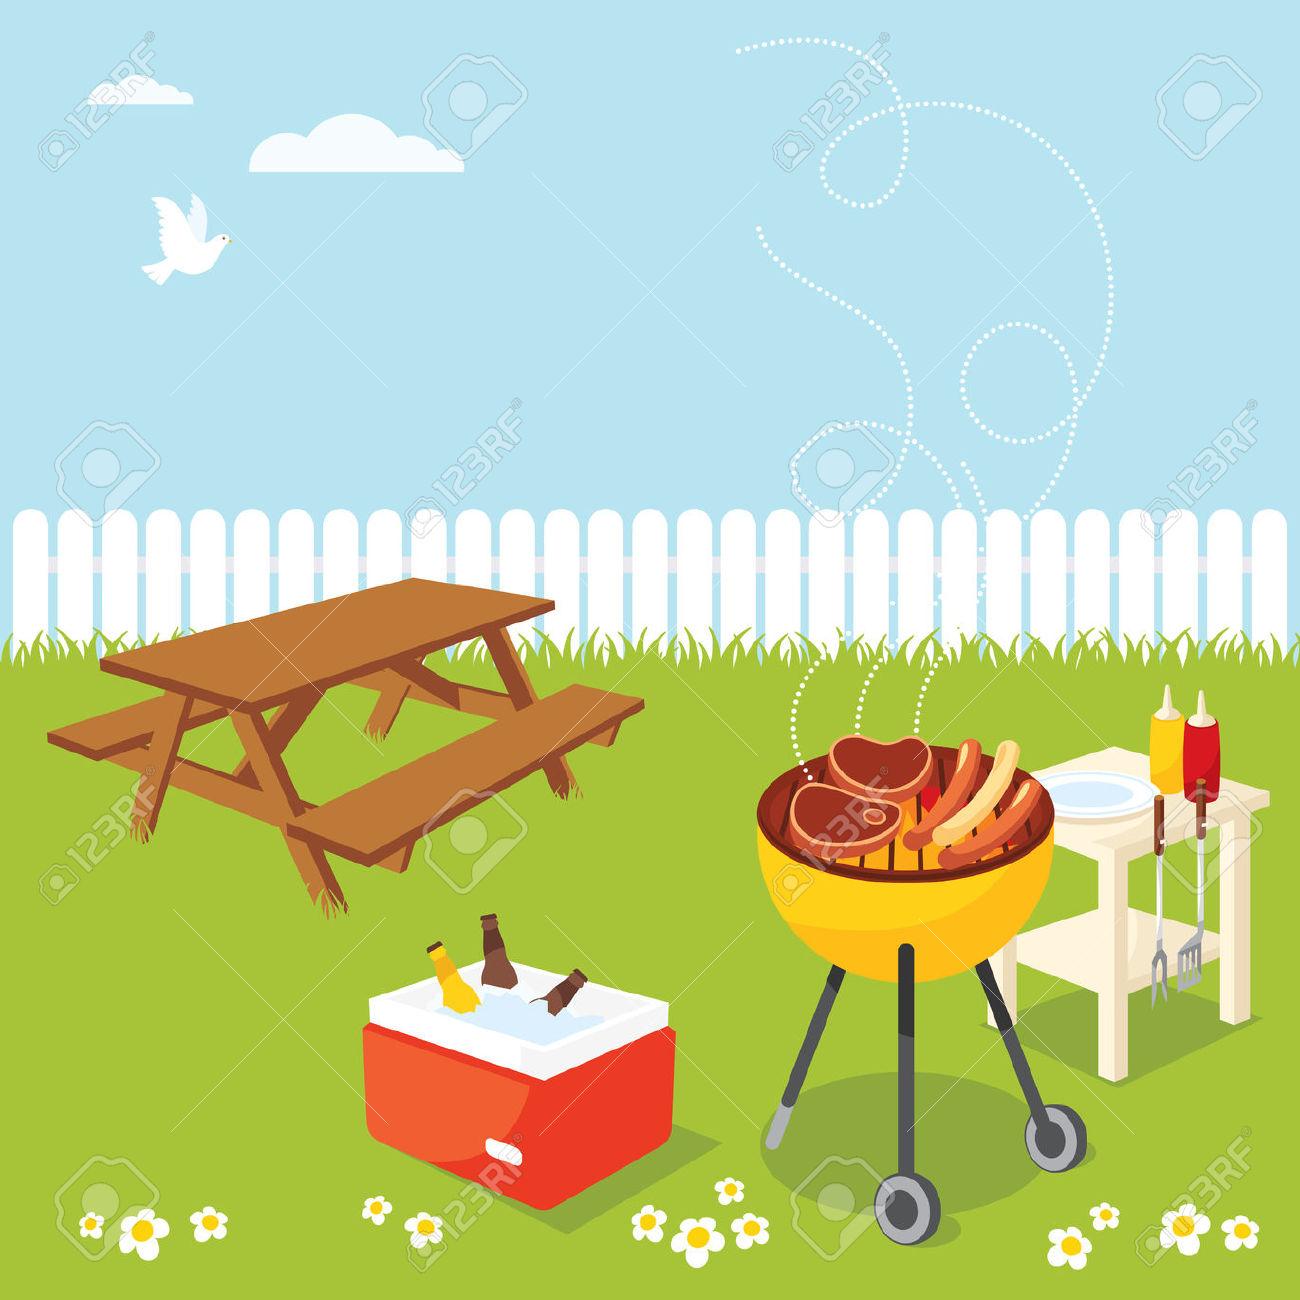 Backyard Clip Art Free.